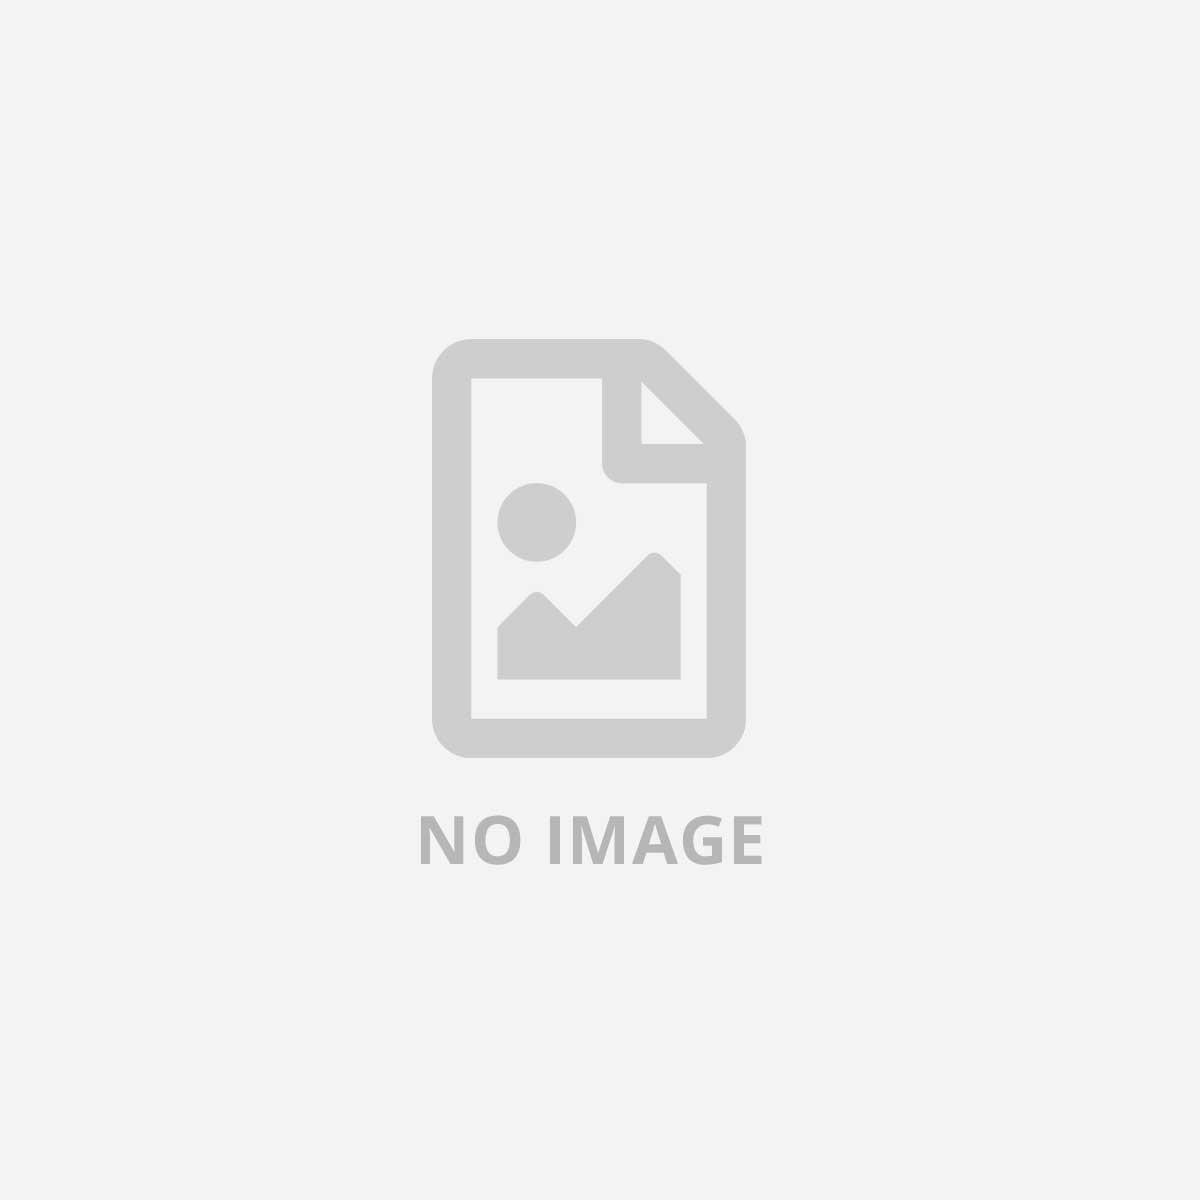 EPSON CARTA FOTOGRAFICA LUCIDA A3+ 20FG